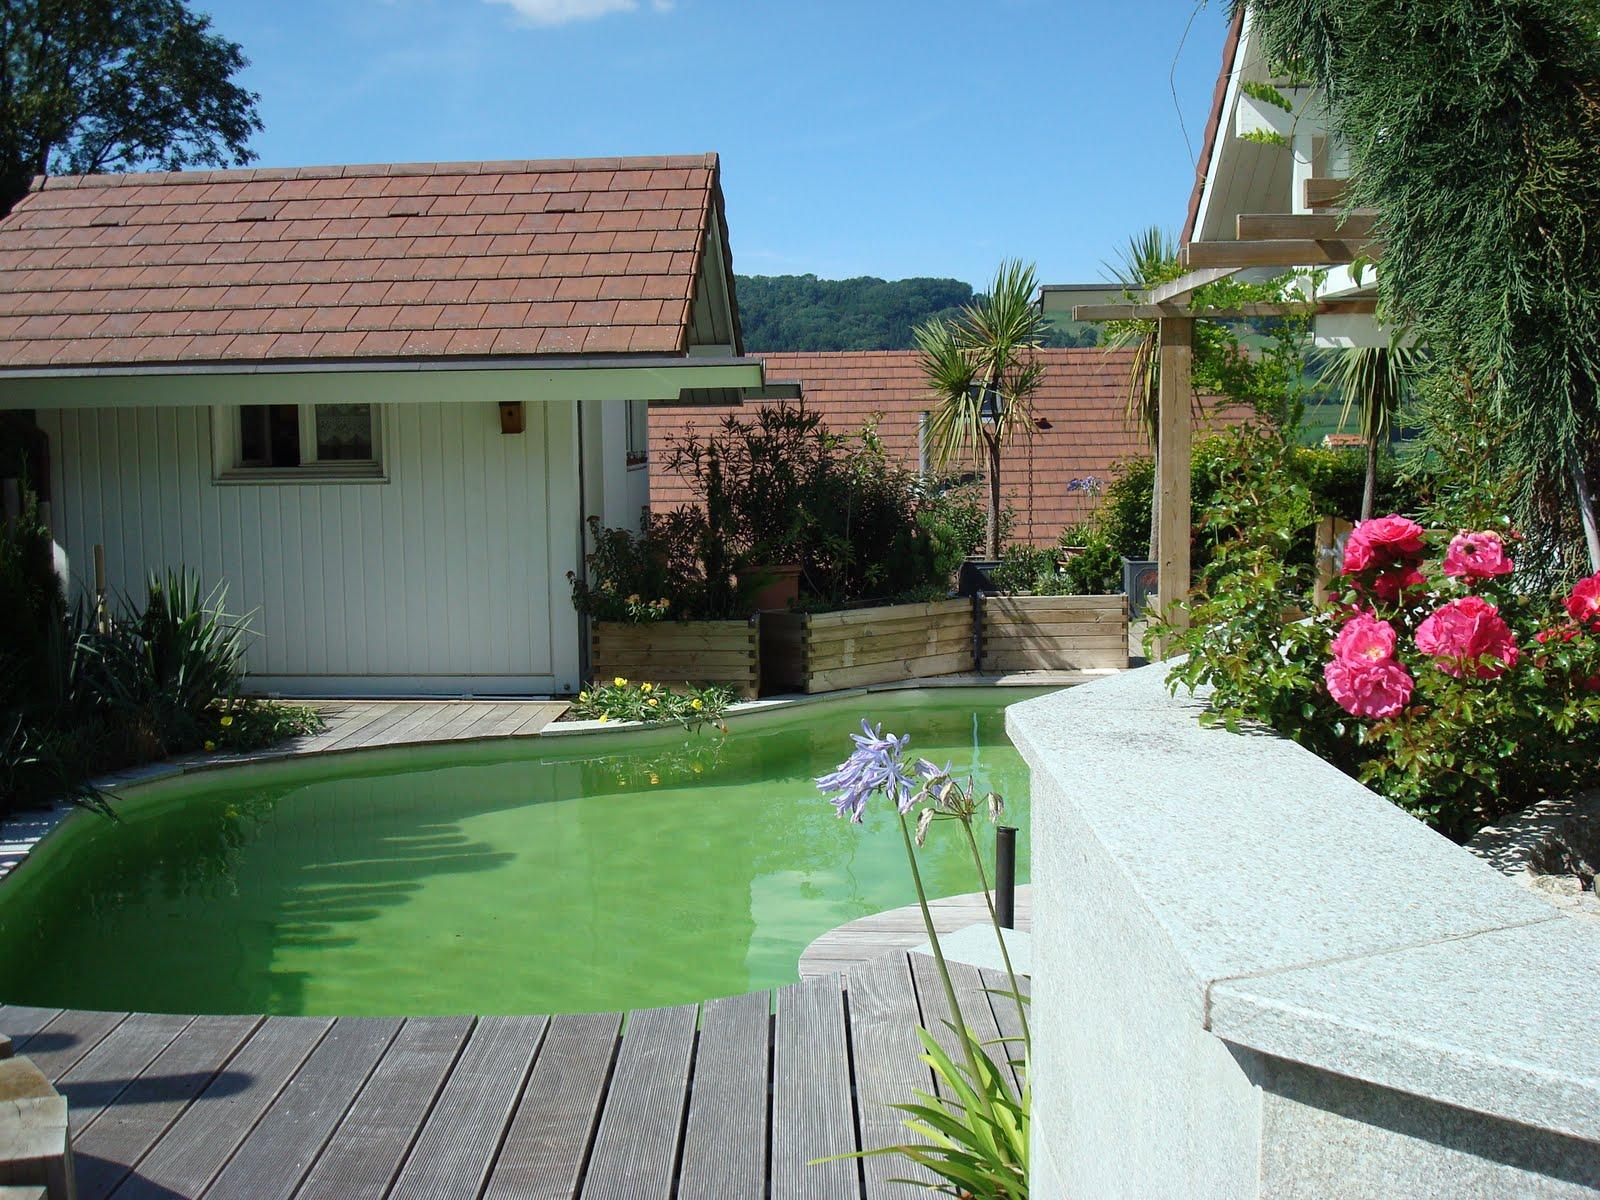 paysagiste et am nagement de jardin thonon et annemasse murets cl tures. Black Bedroom Furniture Sets. Home Design Ideas